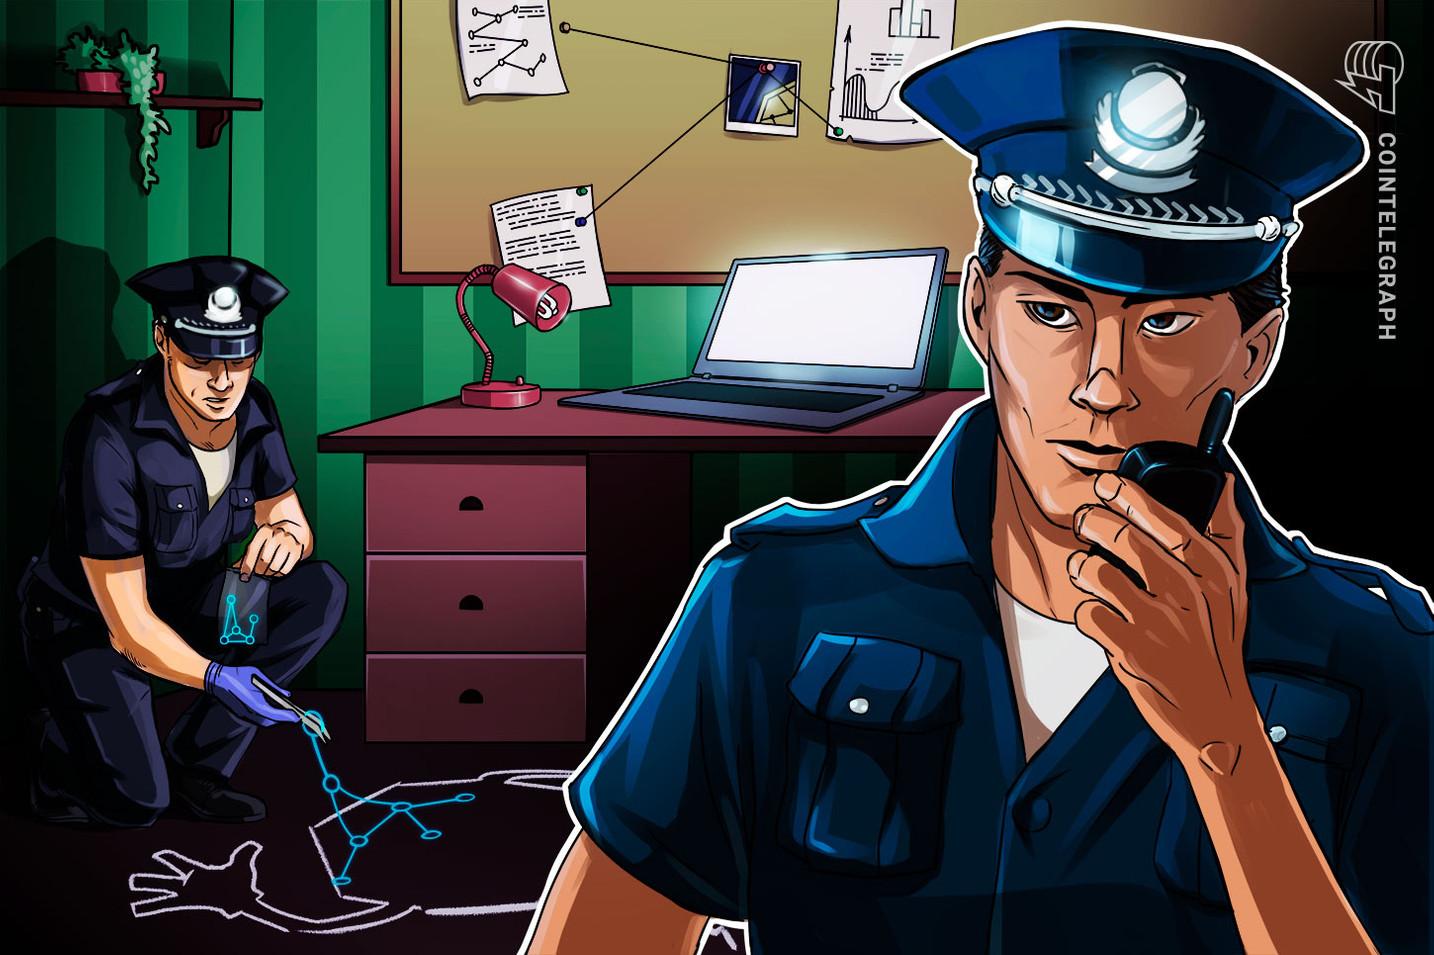 Asesinan en México a chileno y argentino supuestamente vinculados a OneCoin